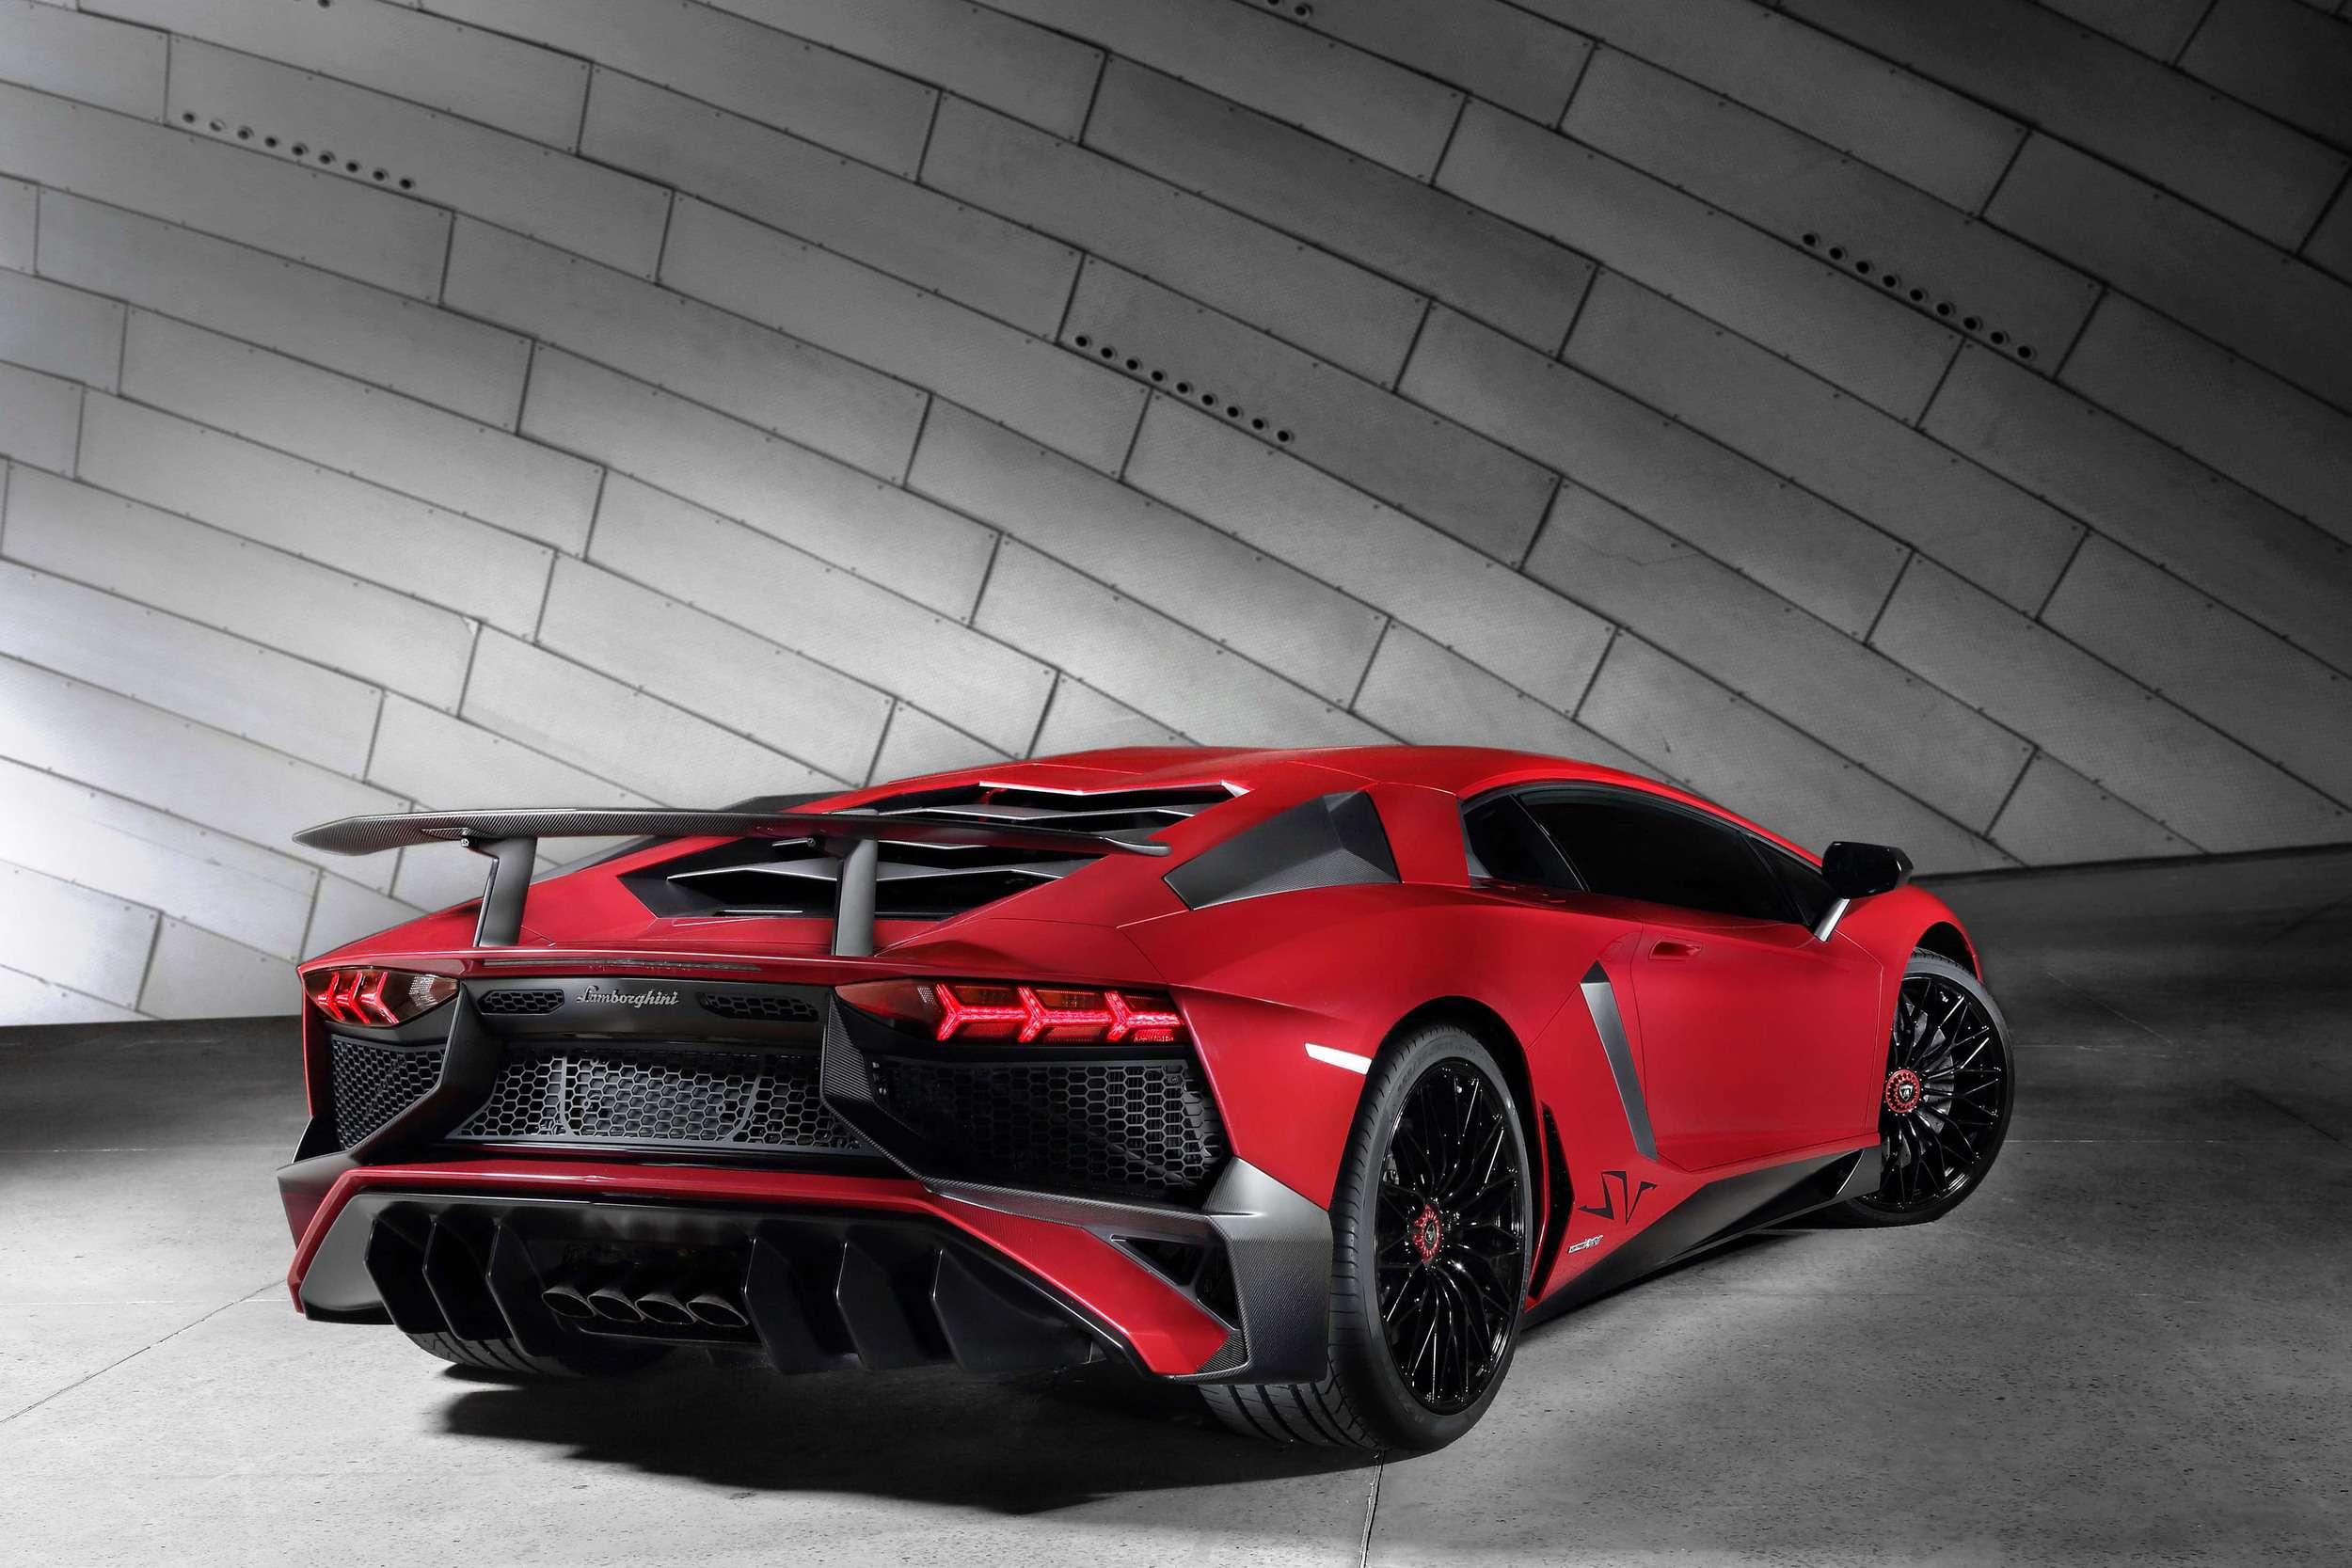 Lamborghini Aventador SV Foto: Lamborghini